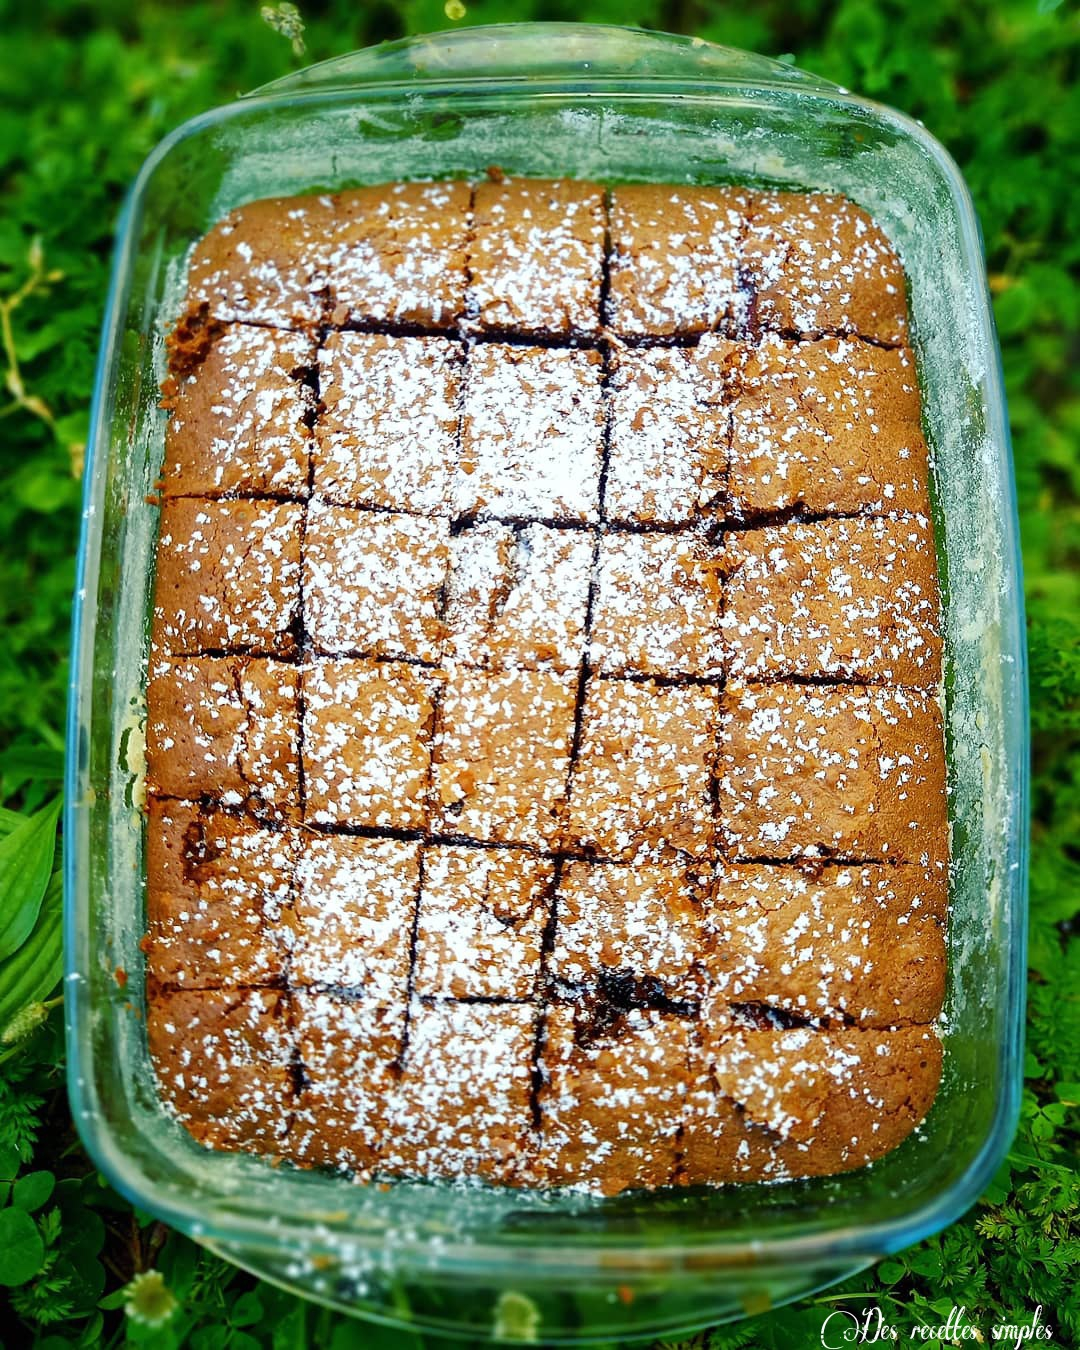 https://www.desrecettessimples-lacuisinedesandy.fr/2021/06/brownies.html